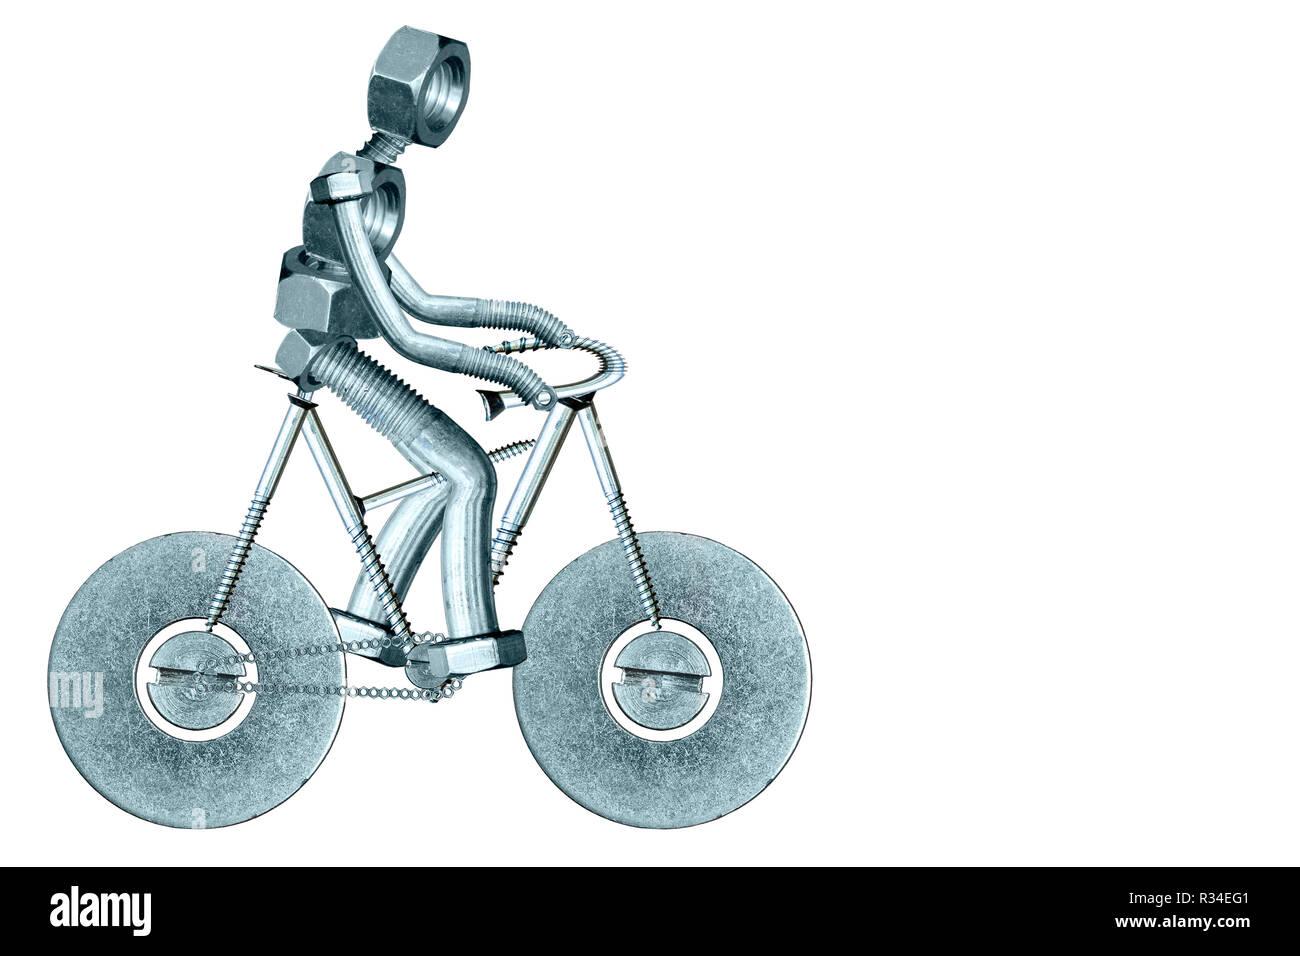 mr groove on his bike - Stock Image